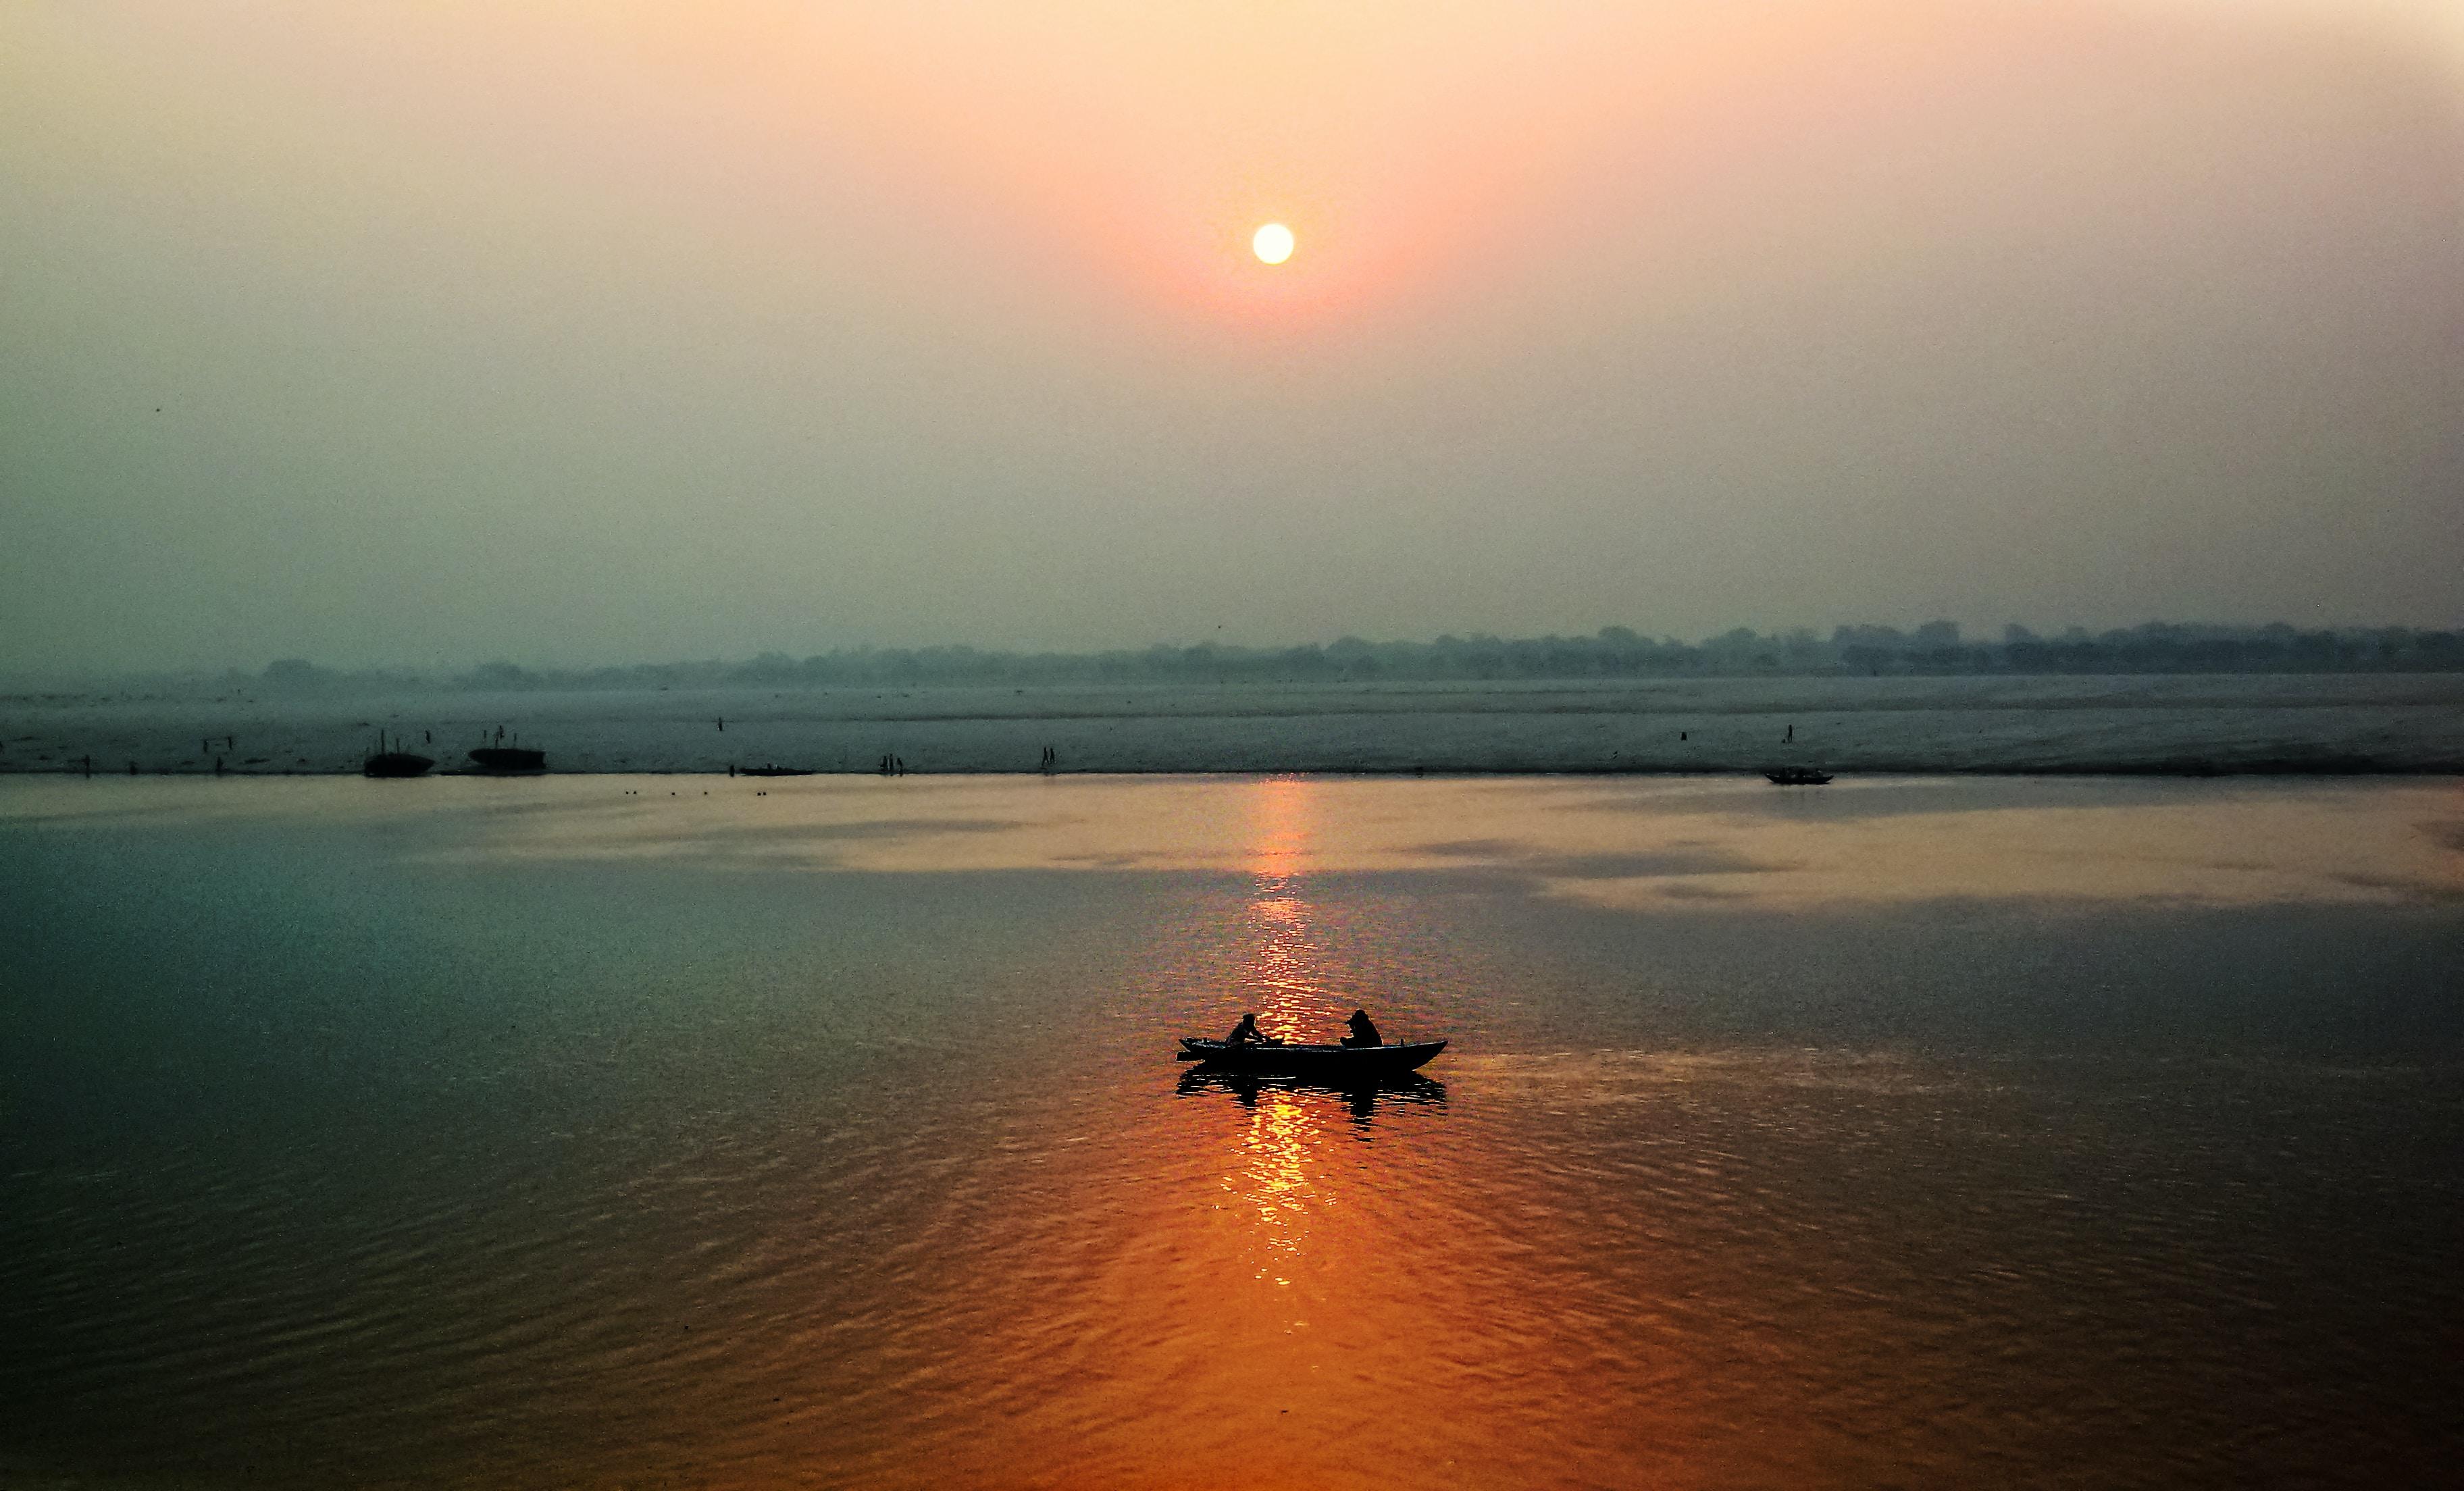 Free Unsplash photo from Omendra Singh